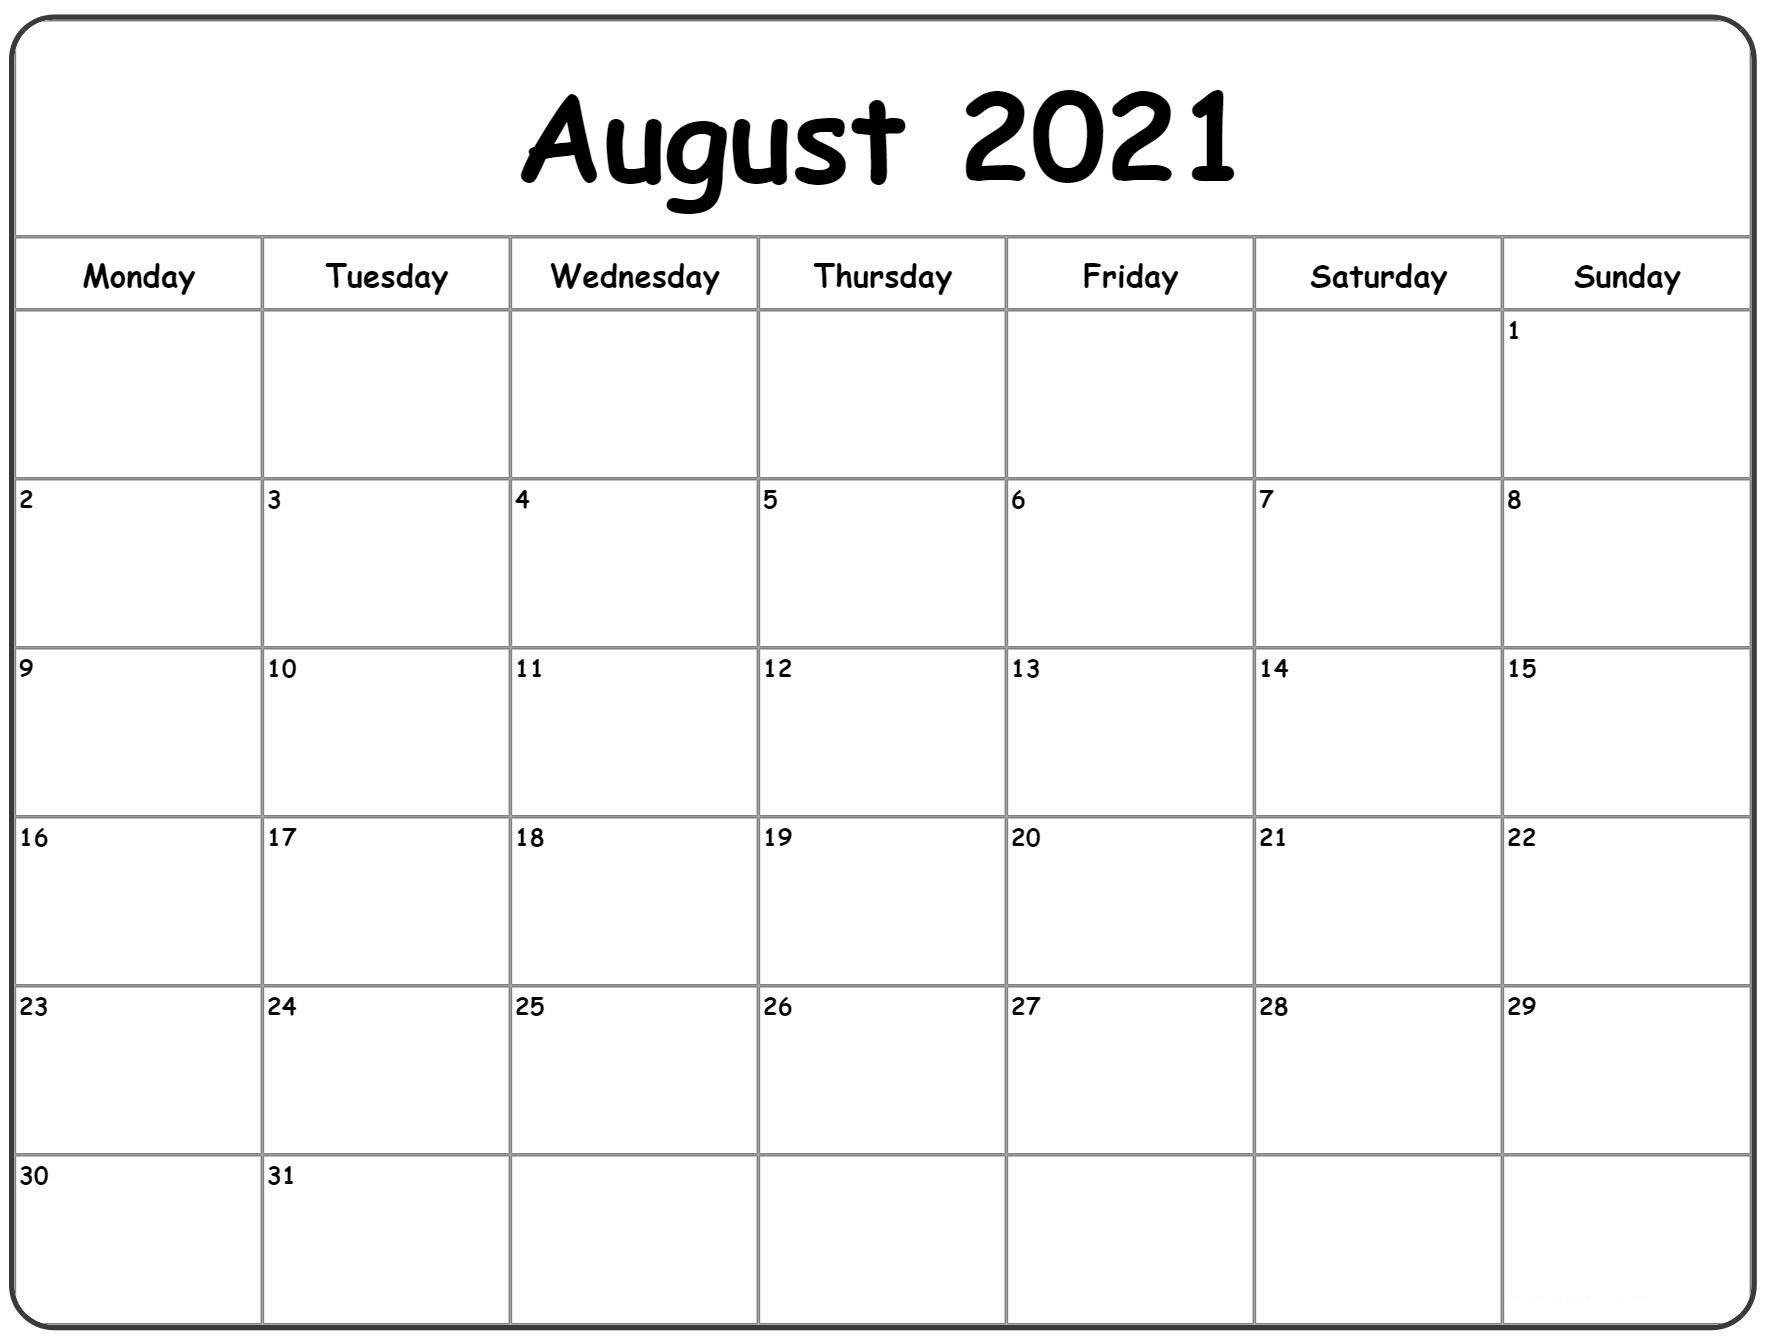 Blank Calendar August 2021 Pdf   Free Printable Calendar inside 2021 Julian Calendar Pdf Image